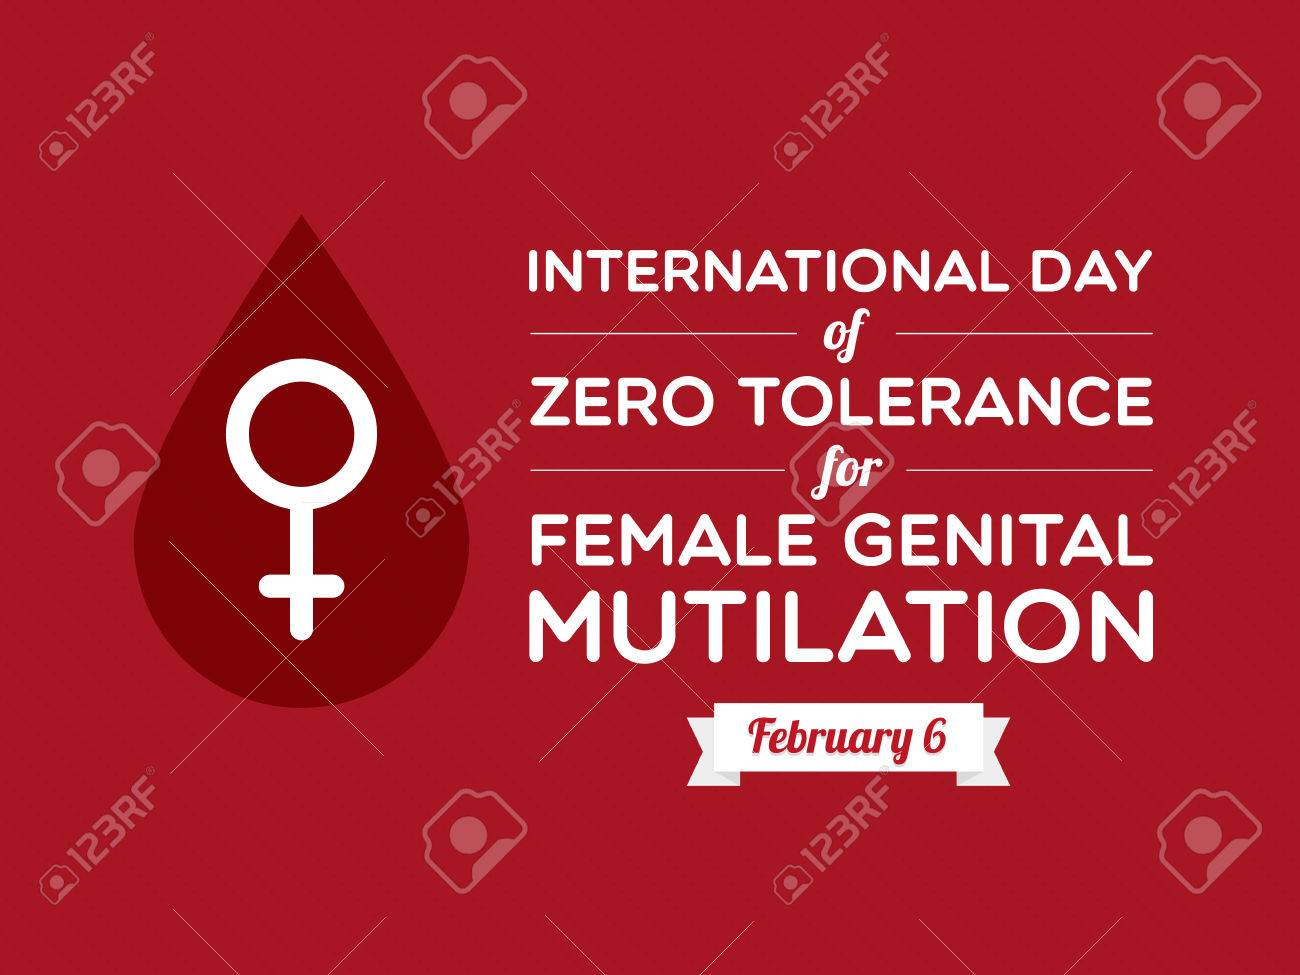 International Day of Zero Tolerance for Female Genital Mutilation - 25250394